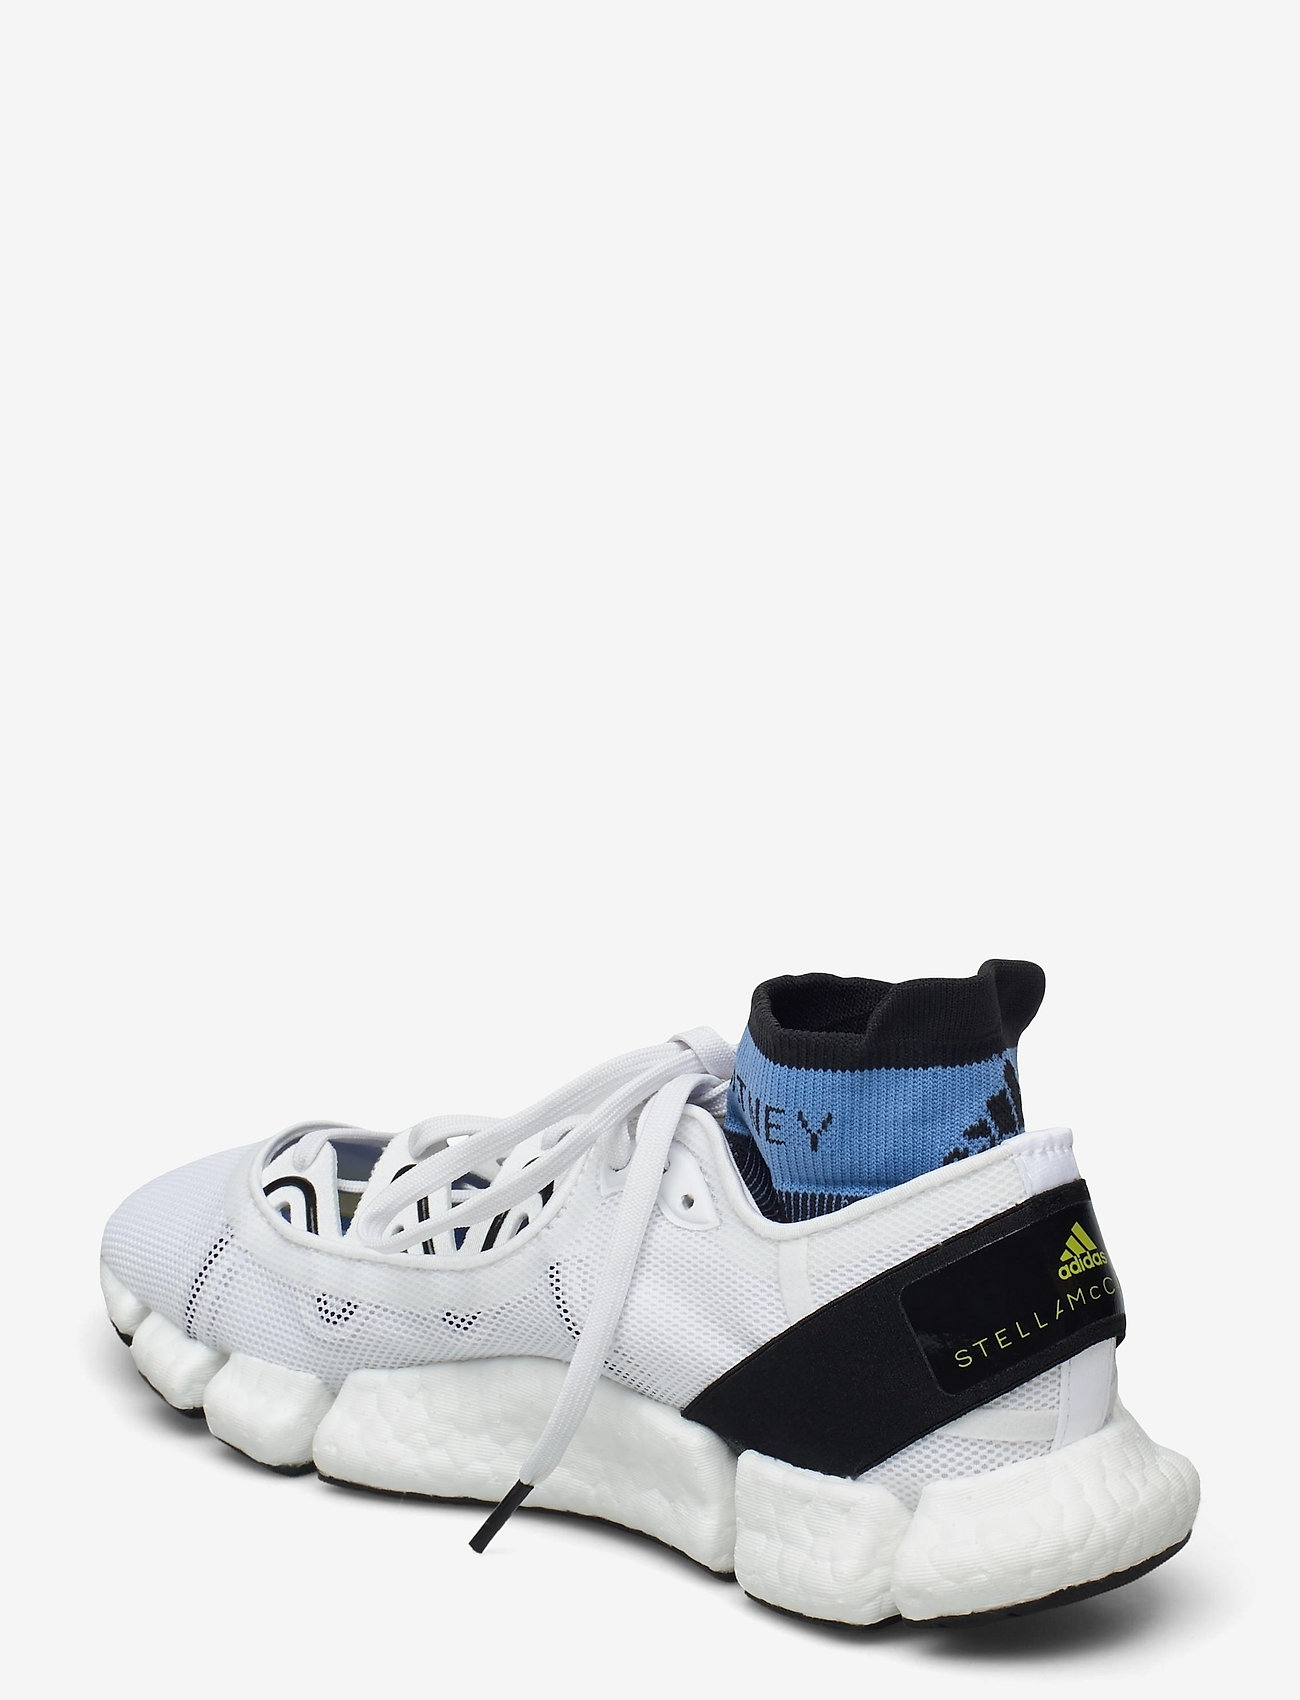 adidas by Stella McCartney - Vento W - running shoes - ftwwht/cblack/stoblu - 2